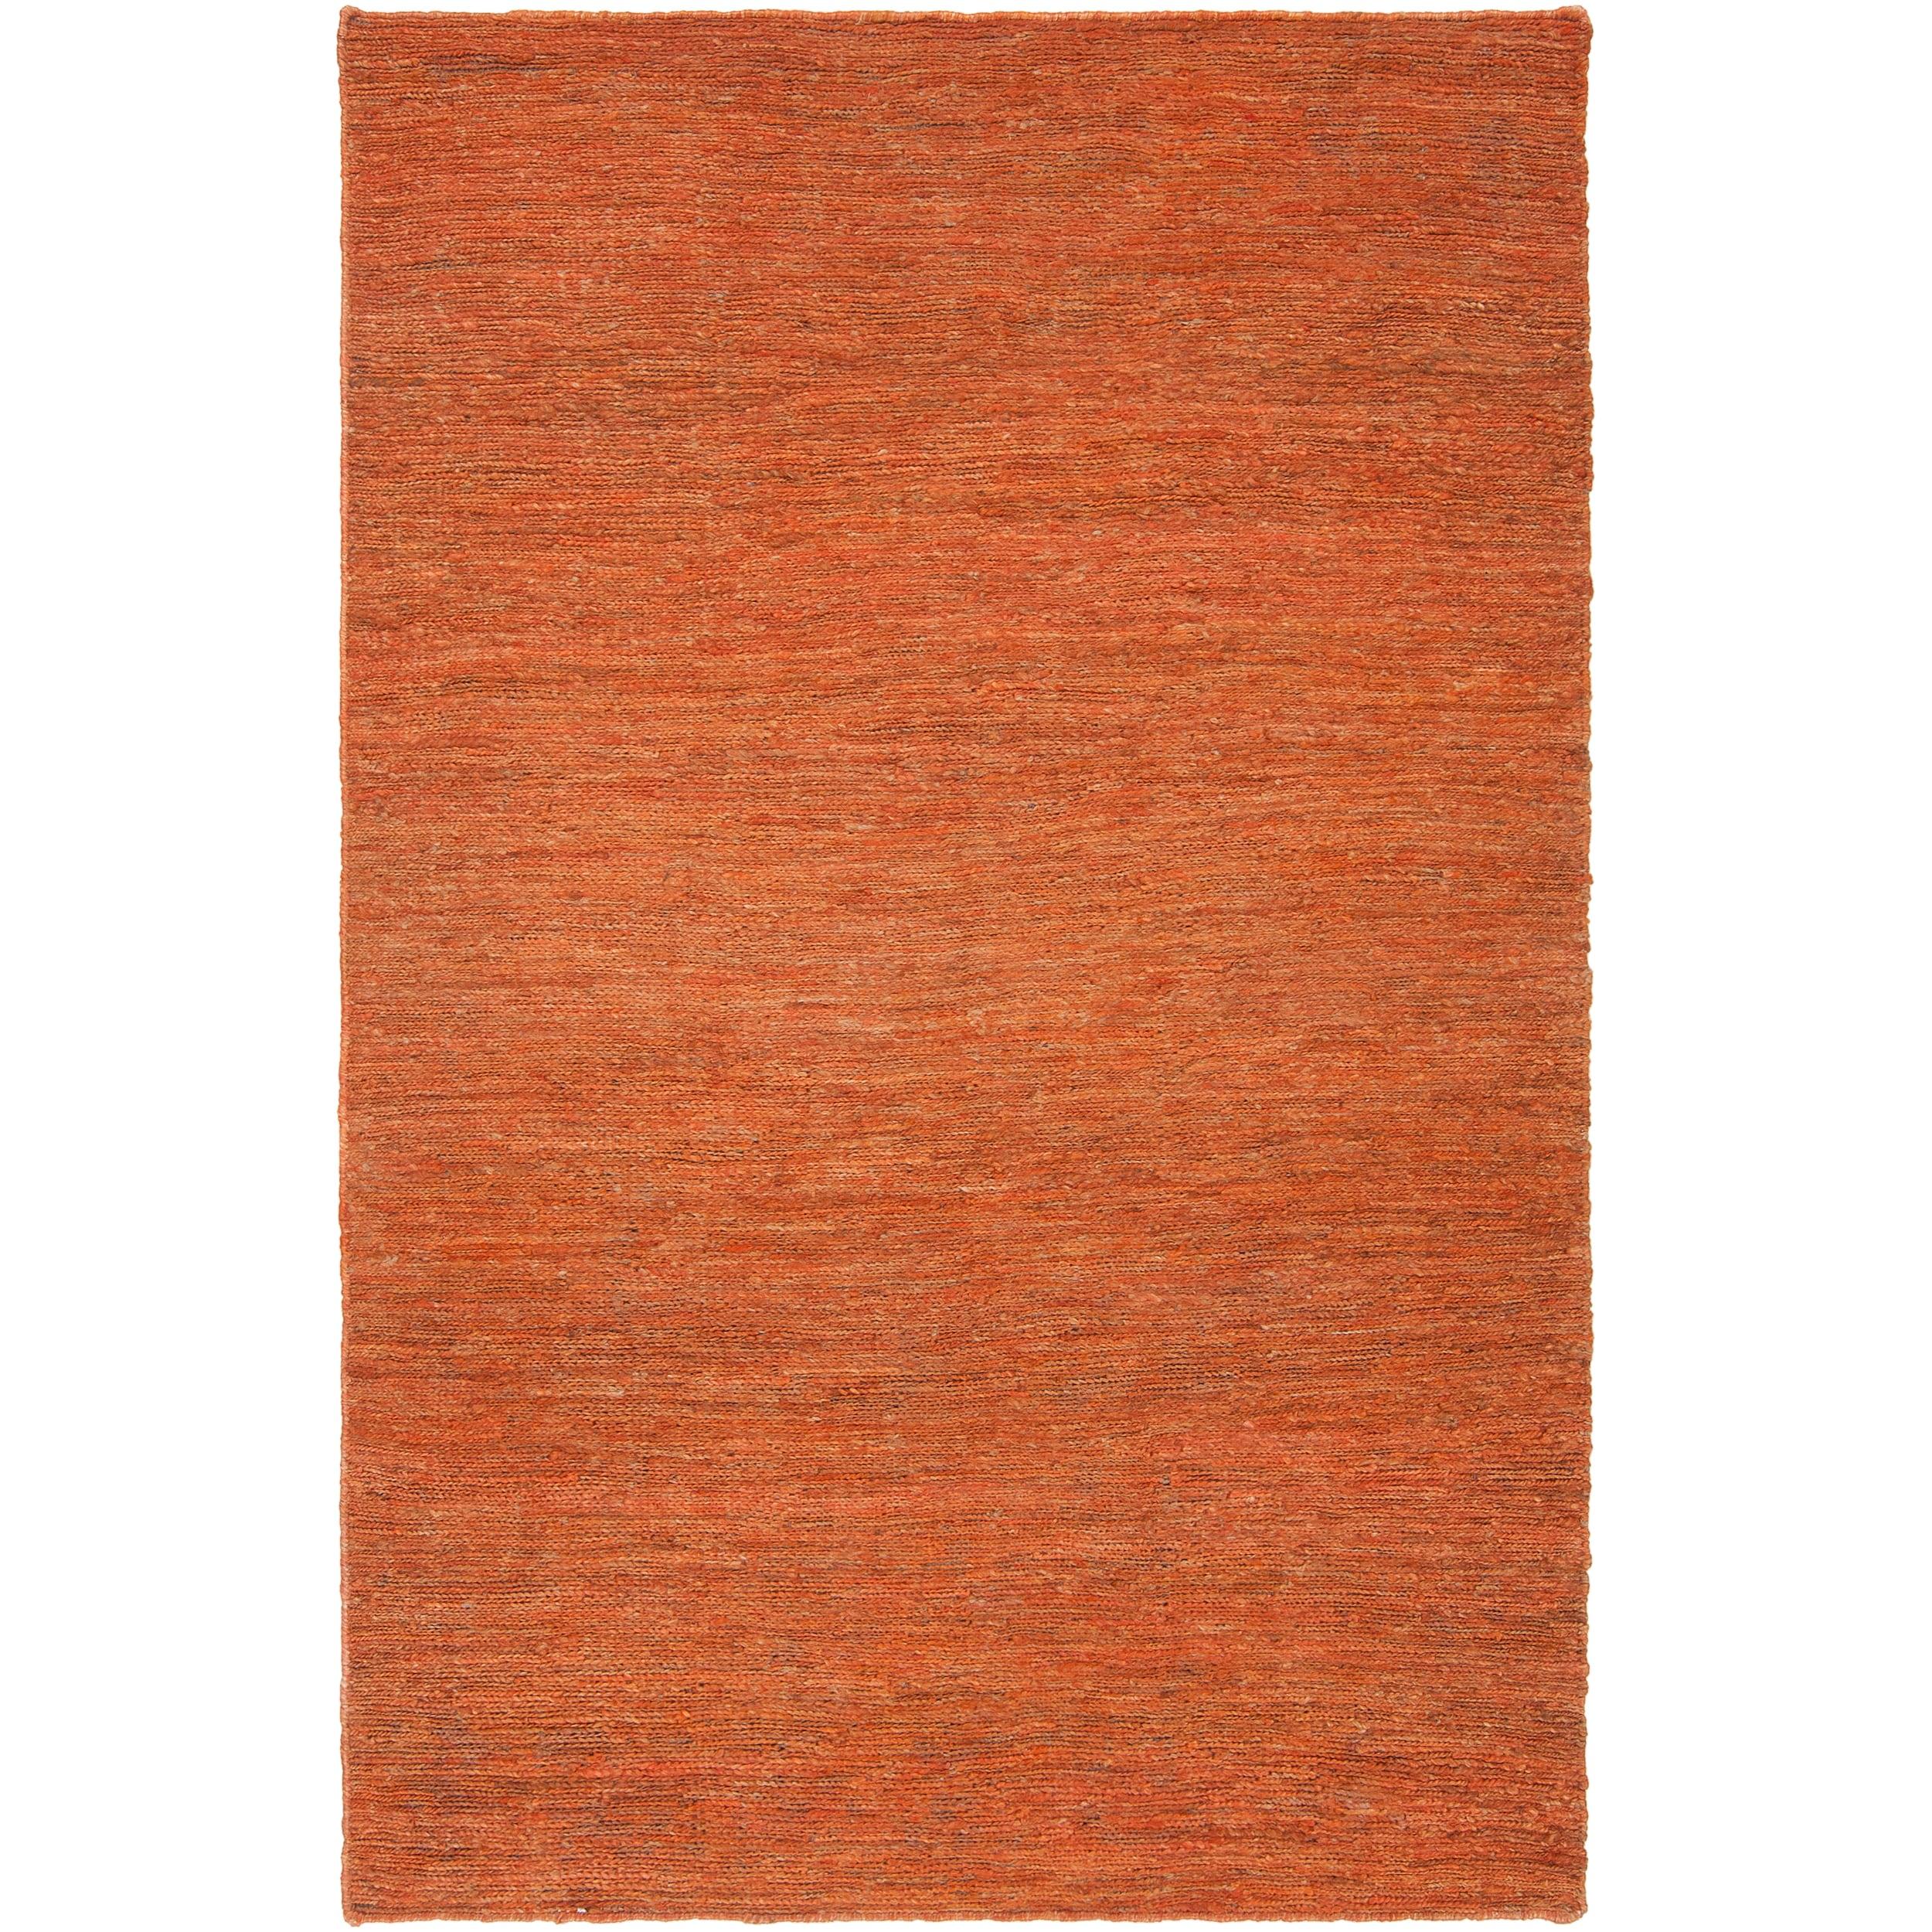 Hand-woven Orange Mozzy Natural Fiber Hemp Rug (3'3 x 5'3)